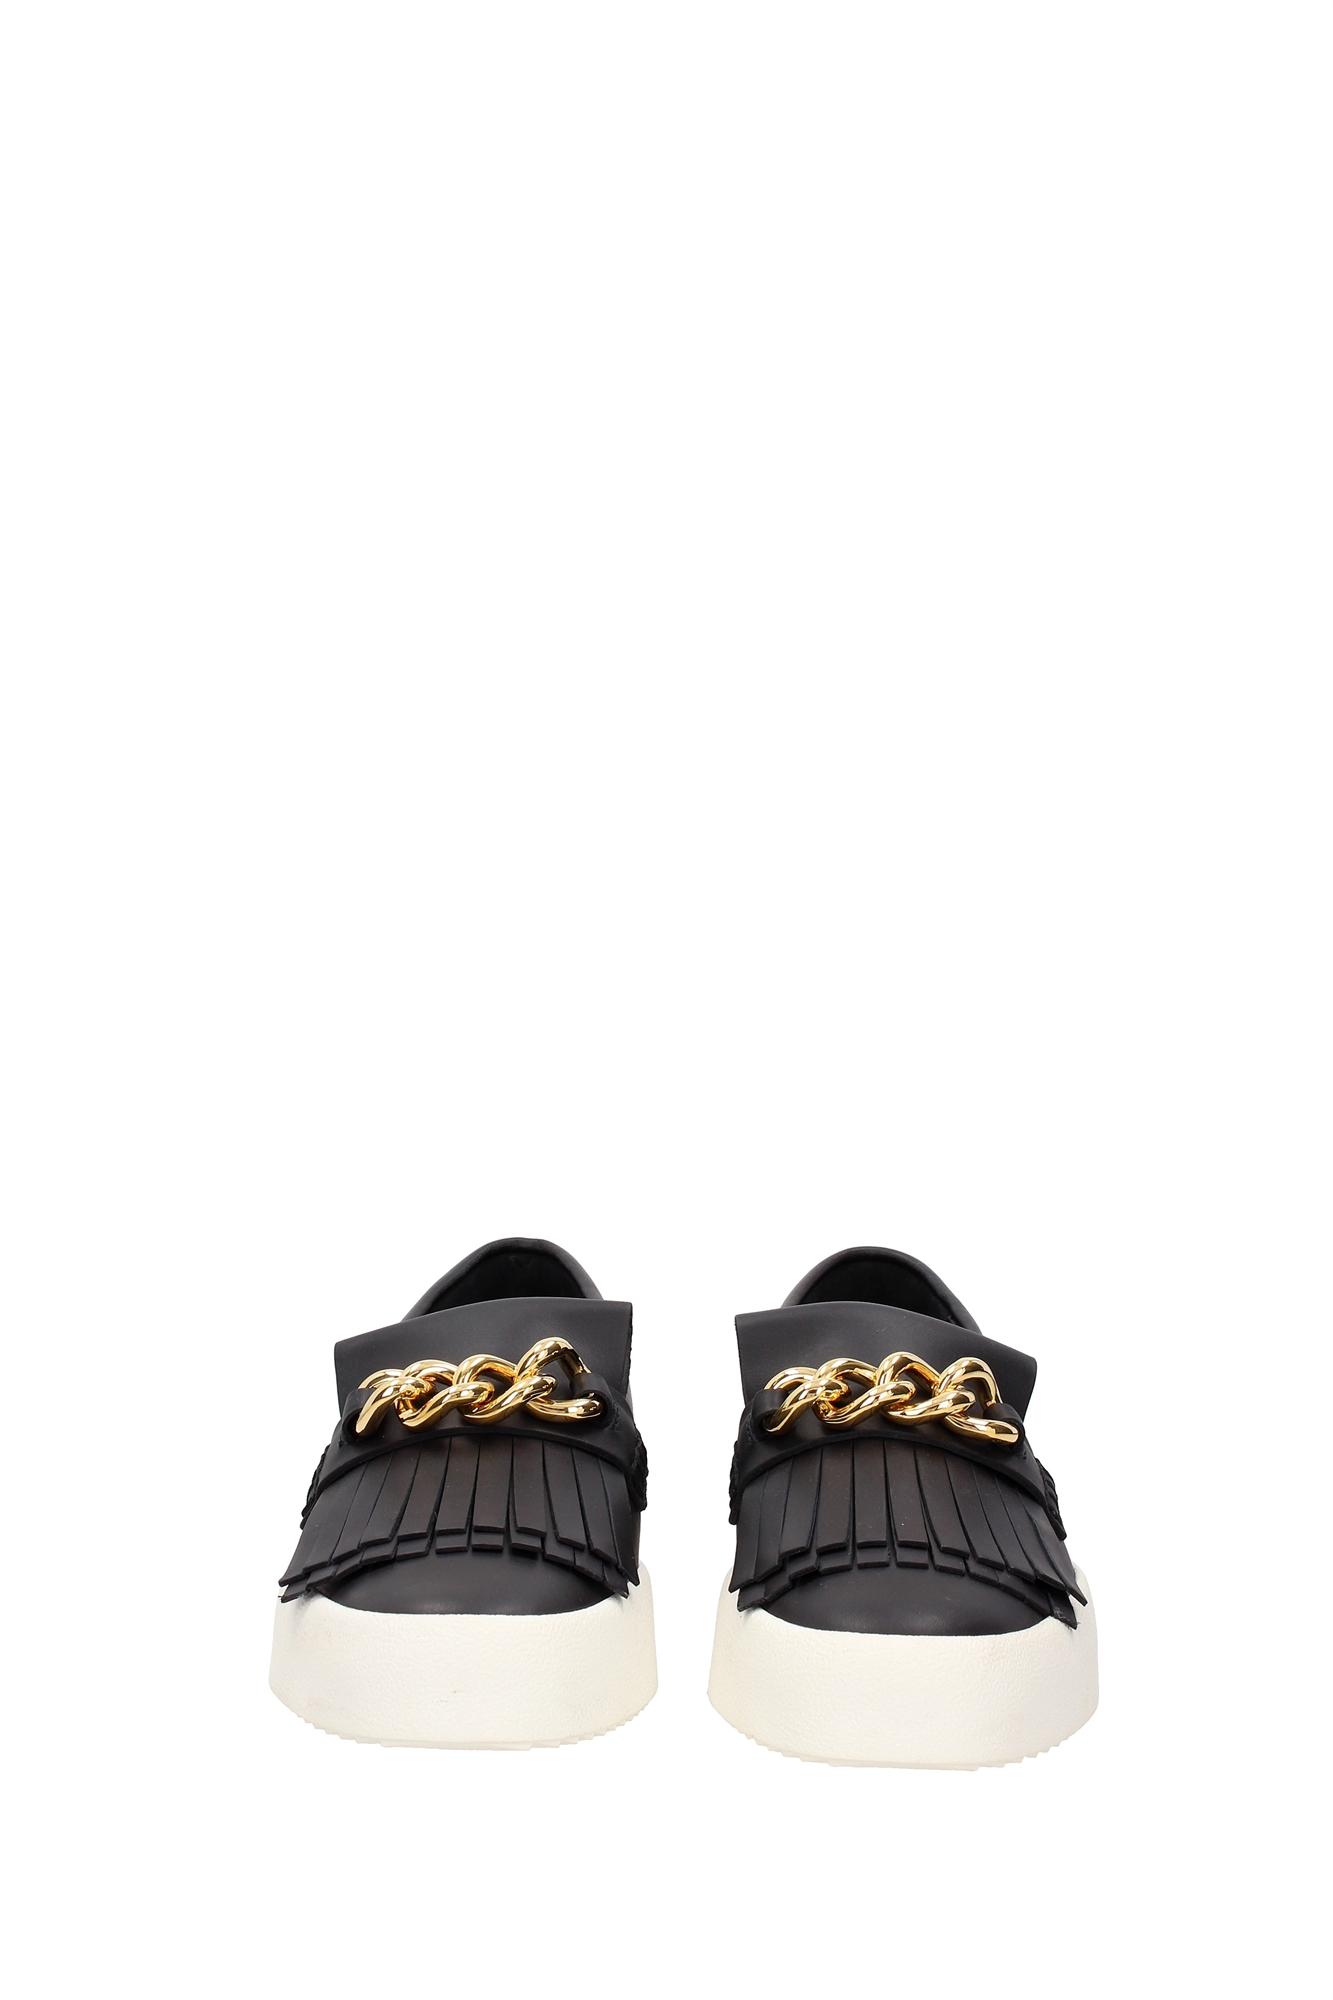 sneakers giuseppe zanotti herren leder schwarz rm6045maynero ebay. Black Bedroom Furniture Sets. Home Design Ideas